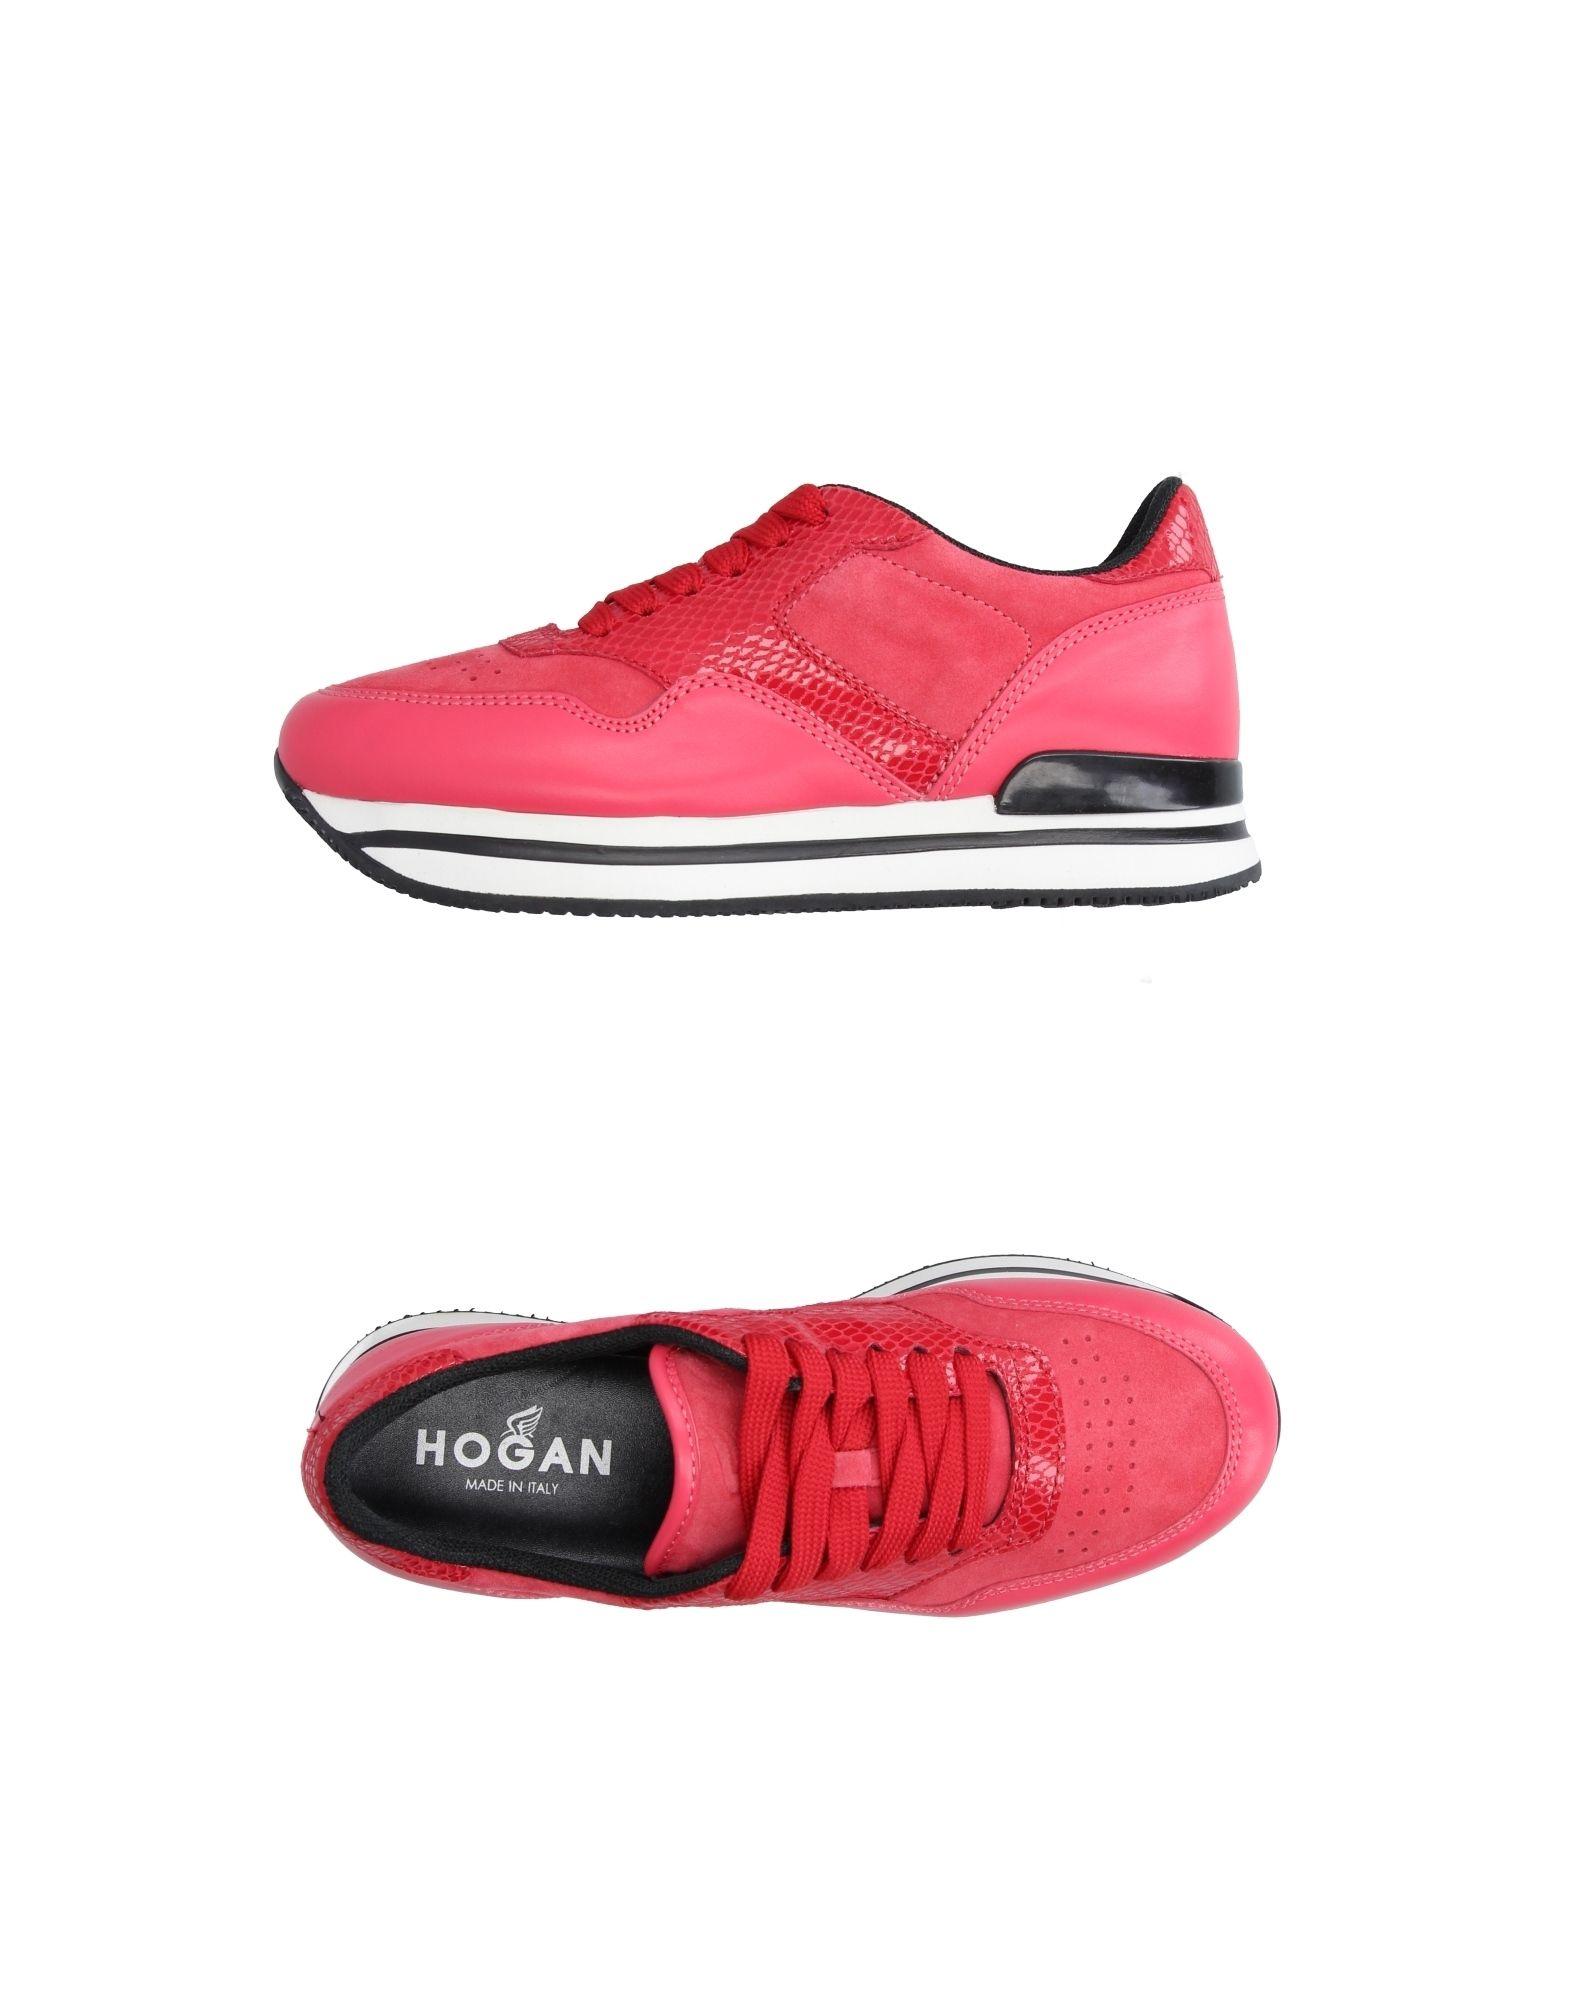 Hogan Sneakers Damen  11214614RUGut aussehende strapazierfähige Schuhe